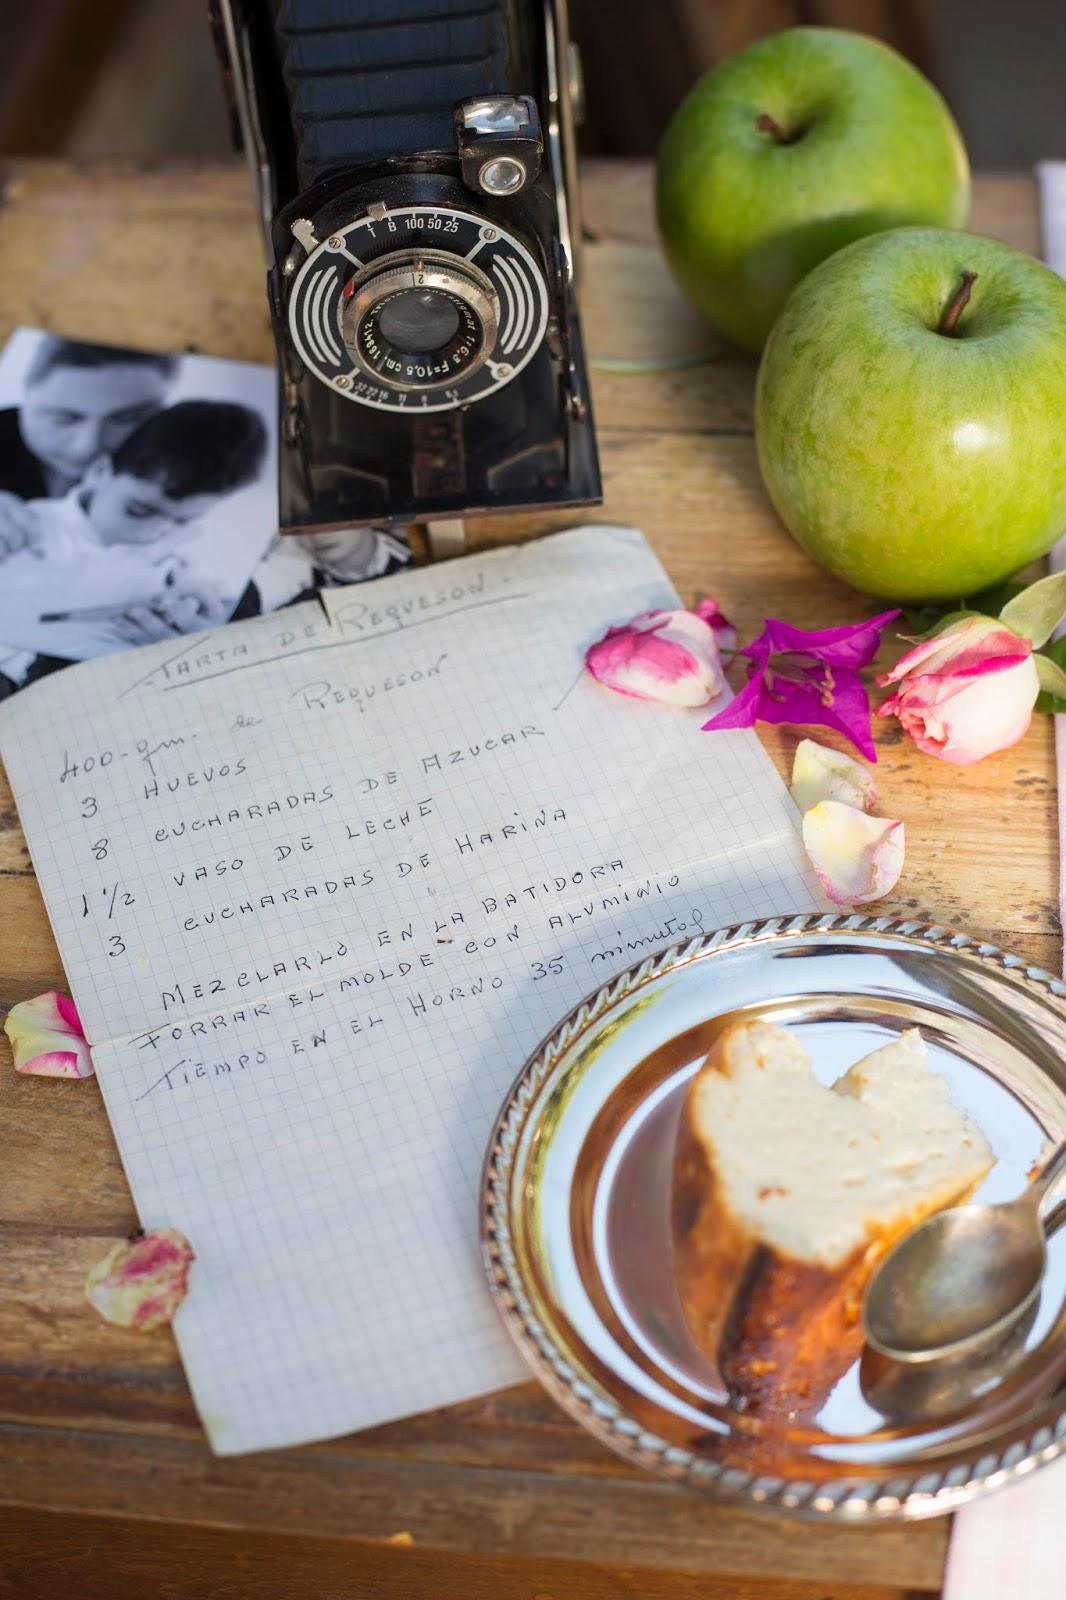 Tarta de requesón en plato de plata de con manzanas verdes con cámara de fotos antigua con flores rosas y púrpura